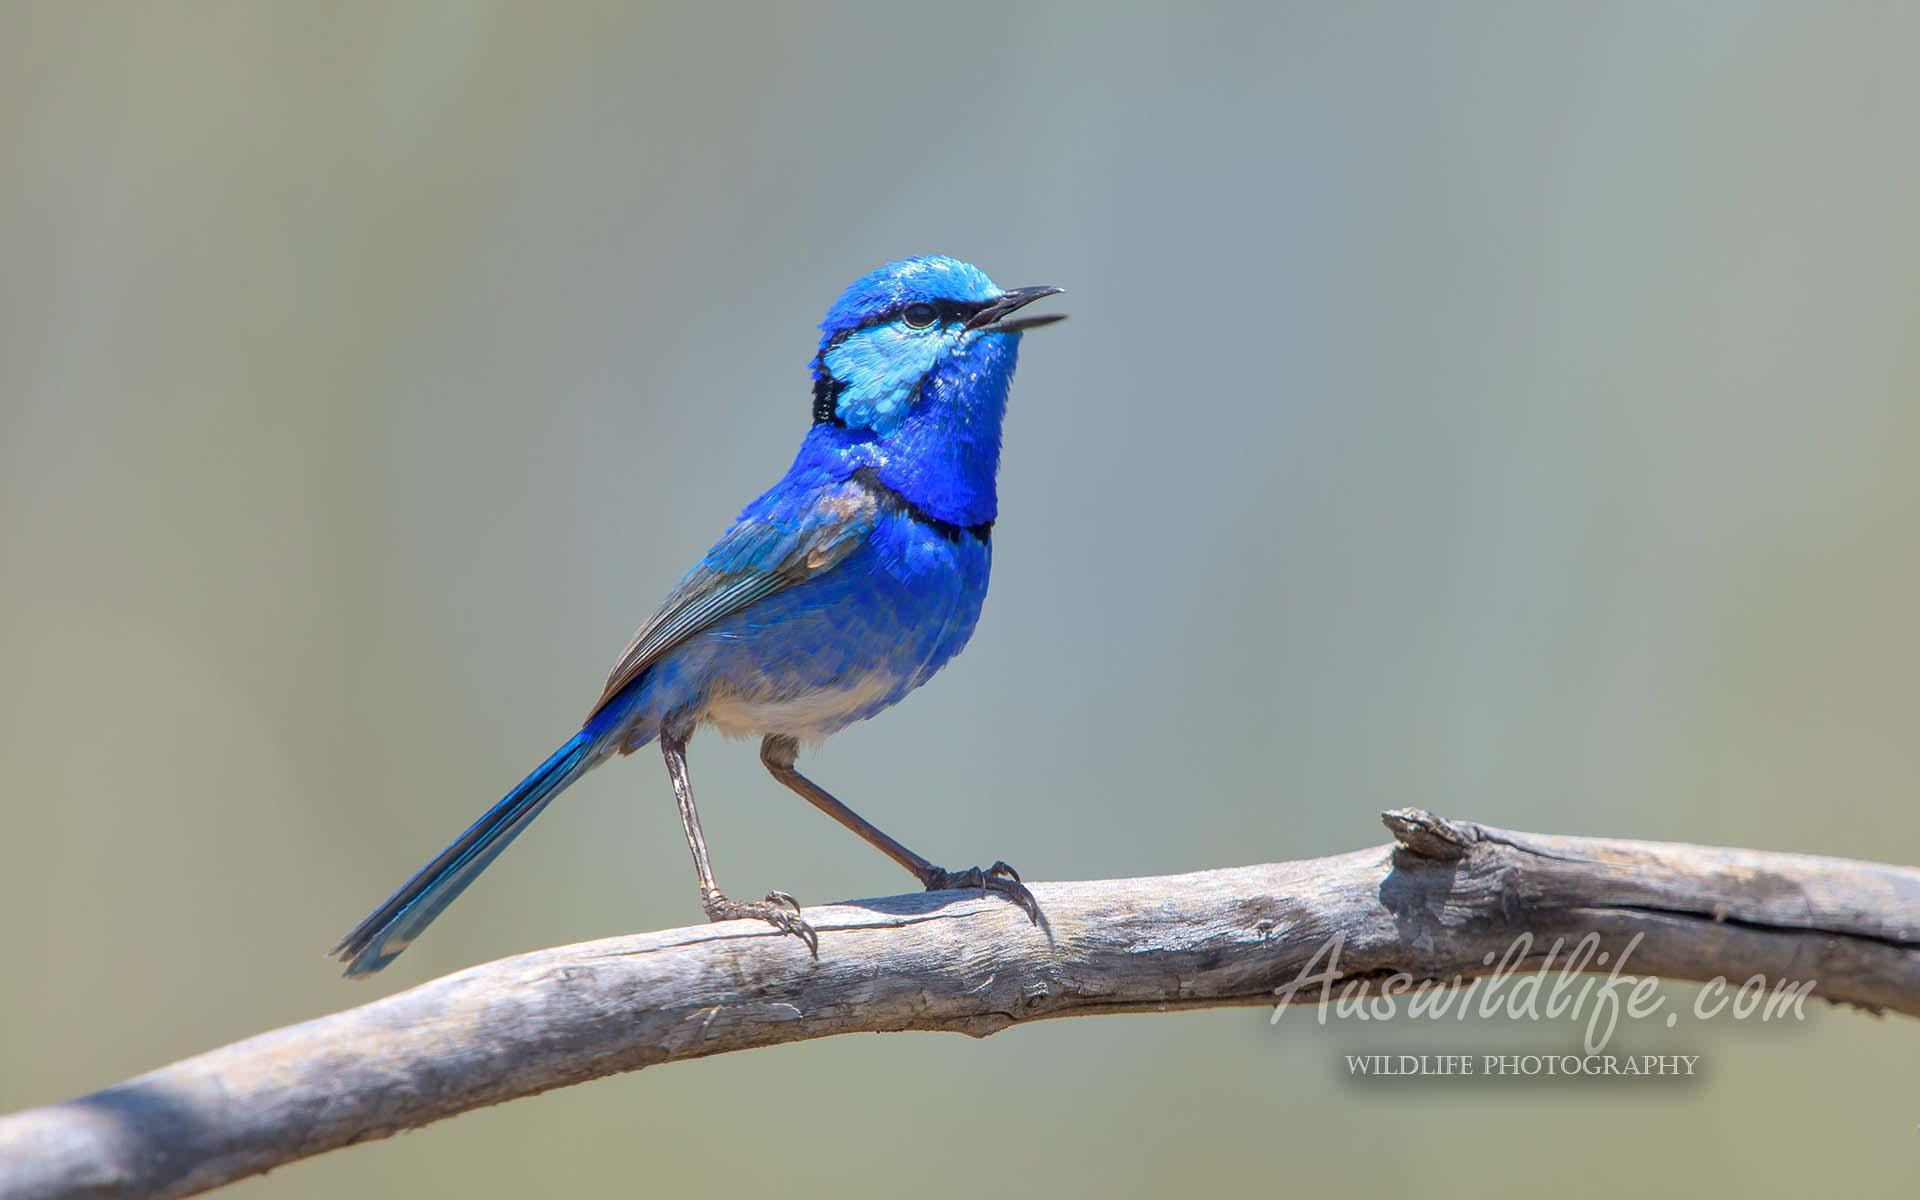 Australian birds stock images